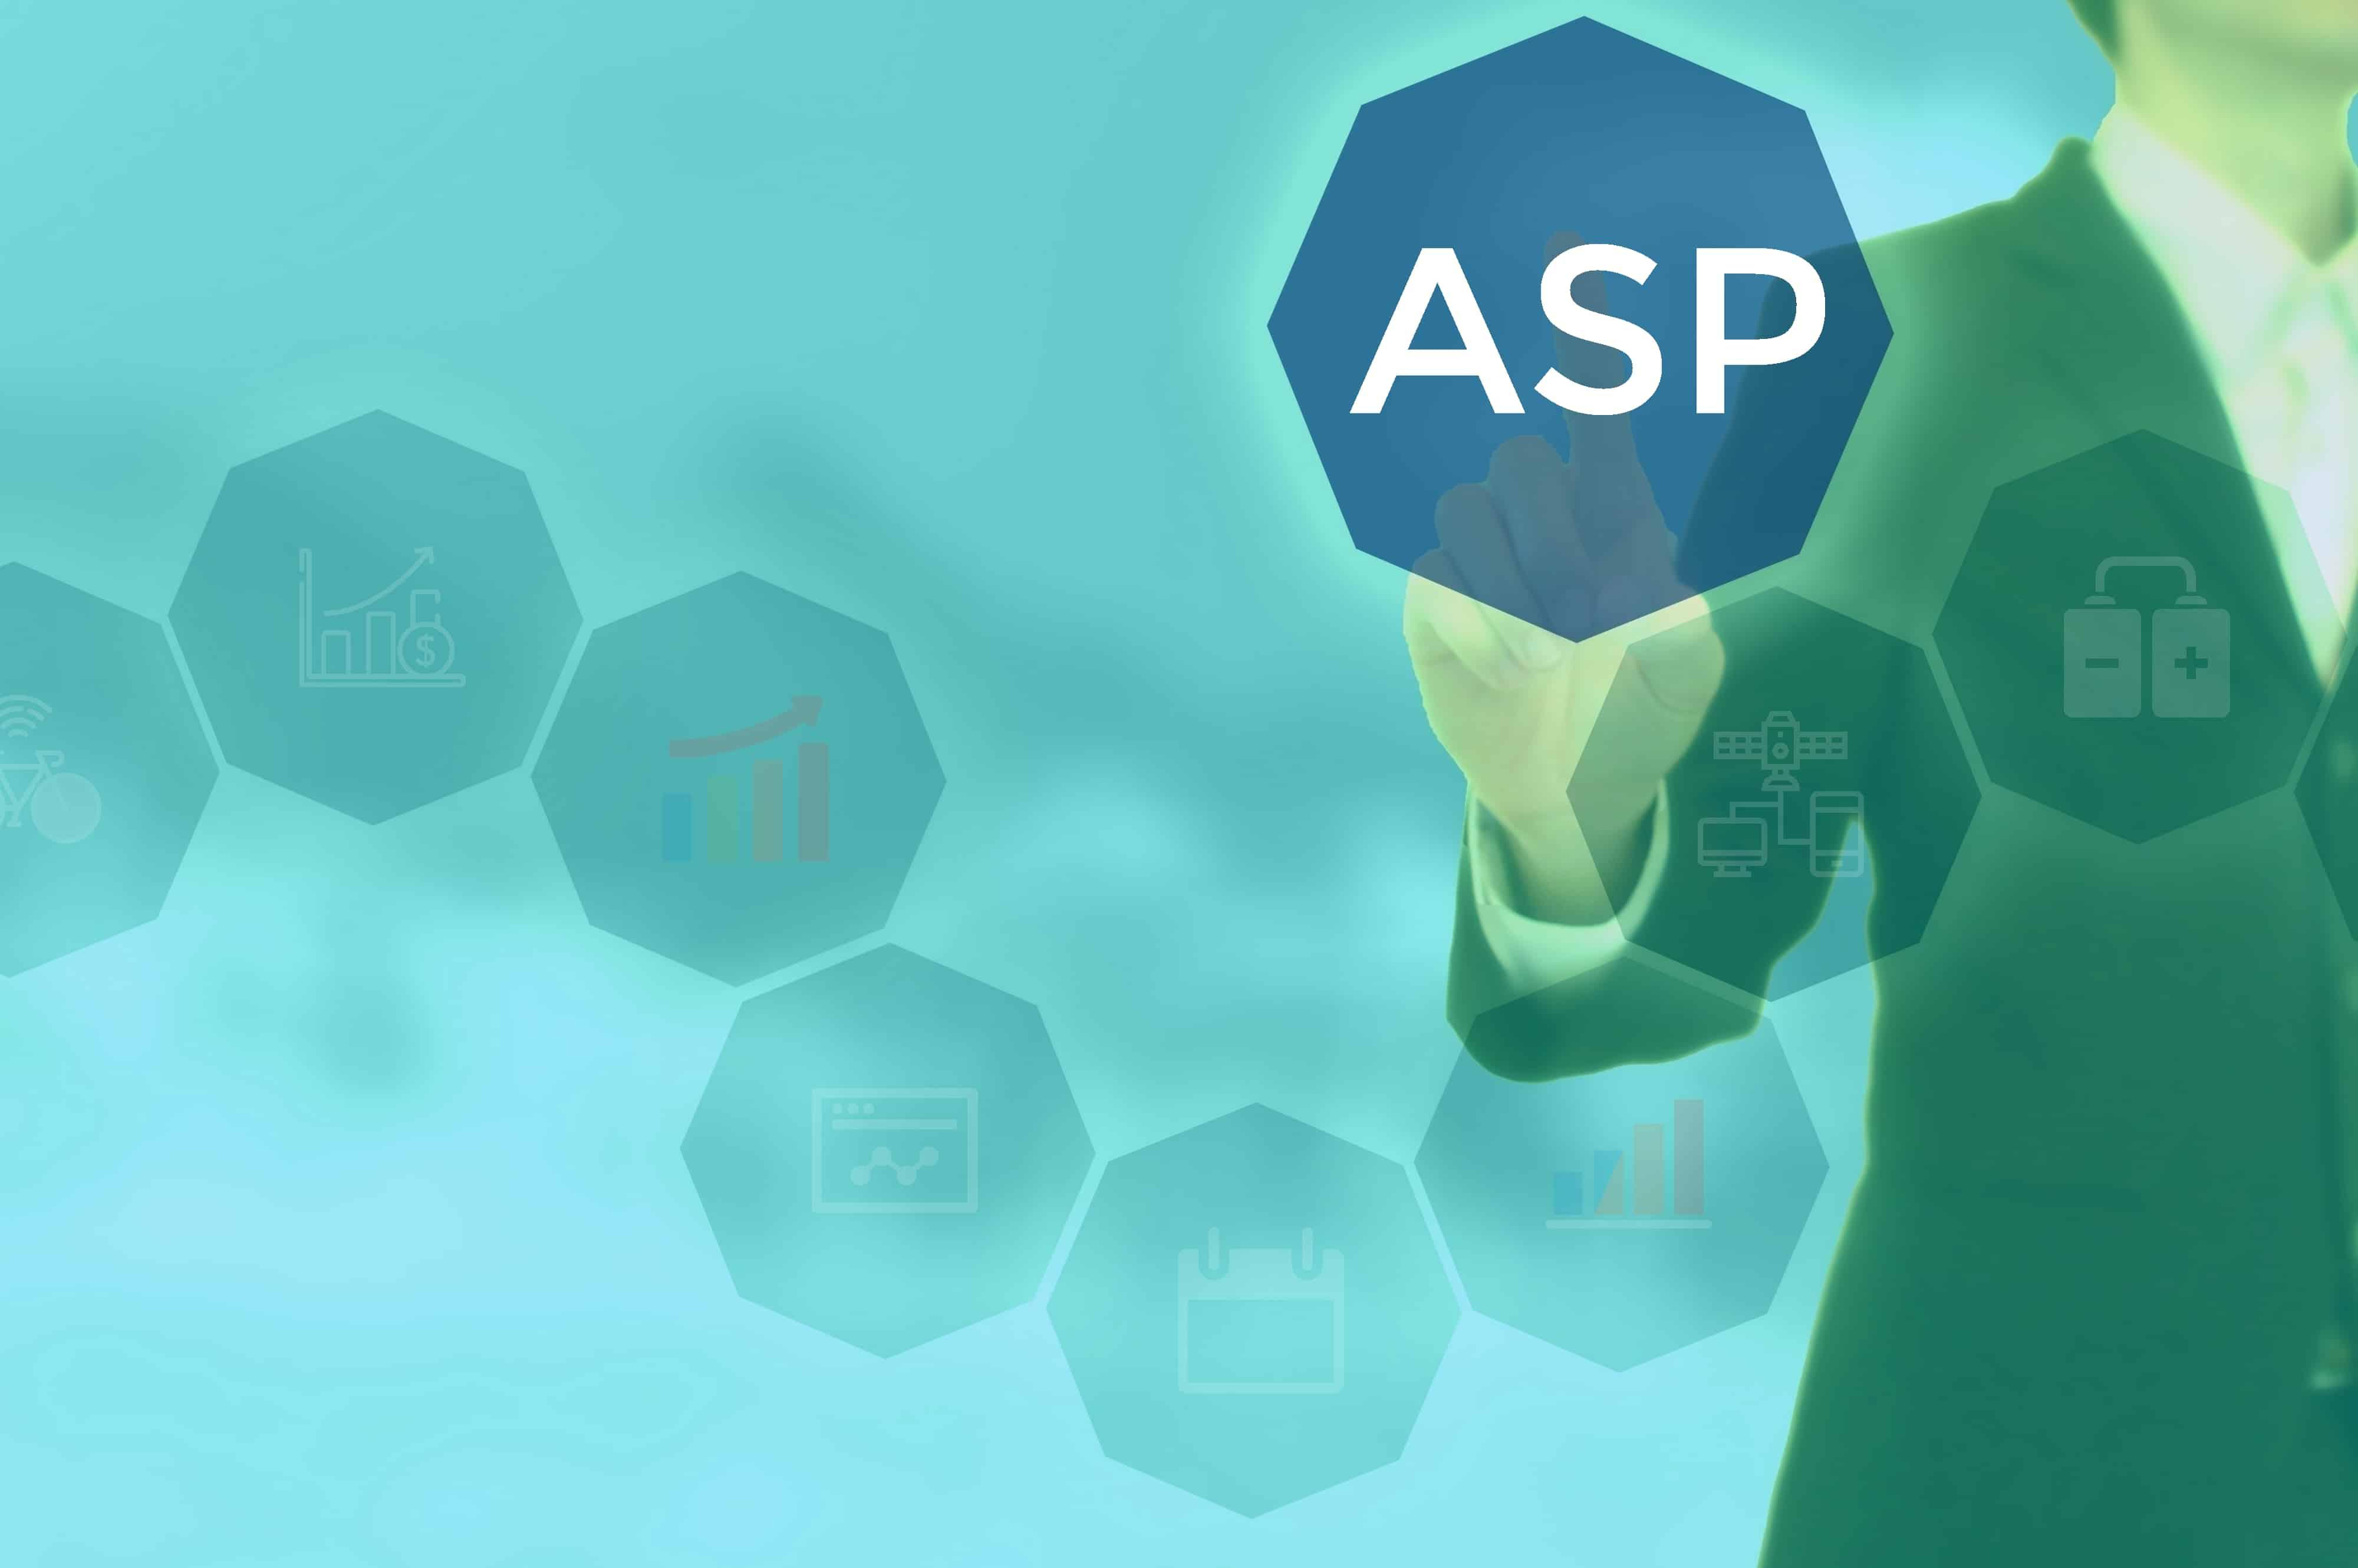 ASPはどういう基準で選んだらいいの?